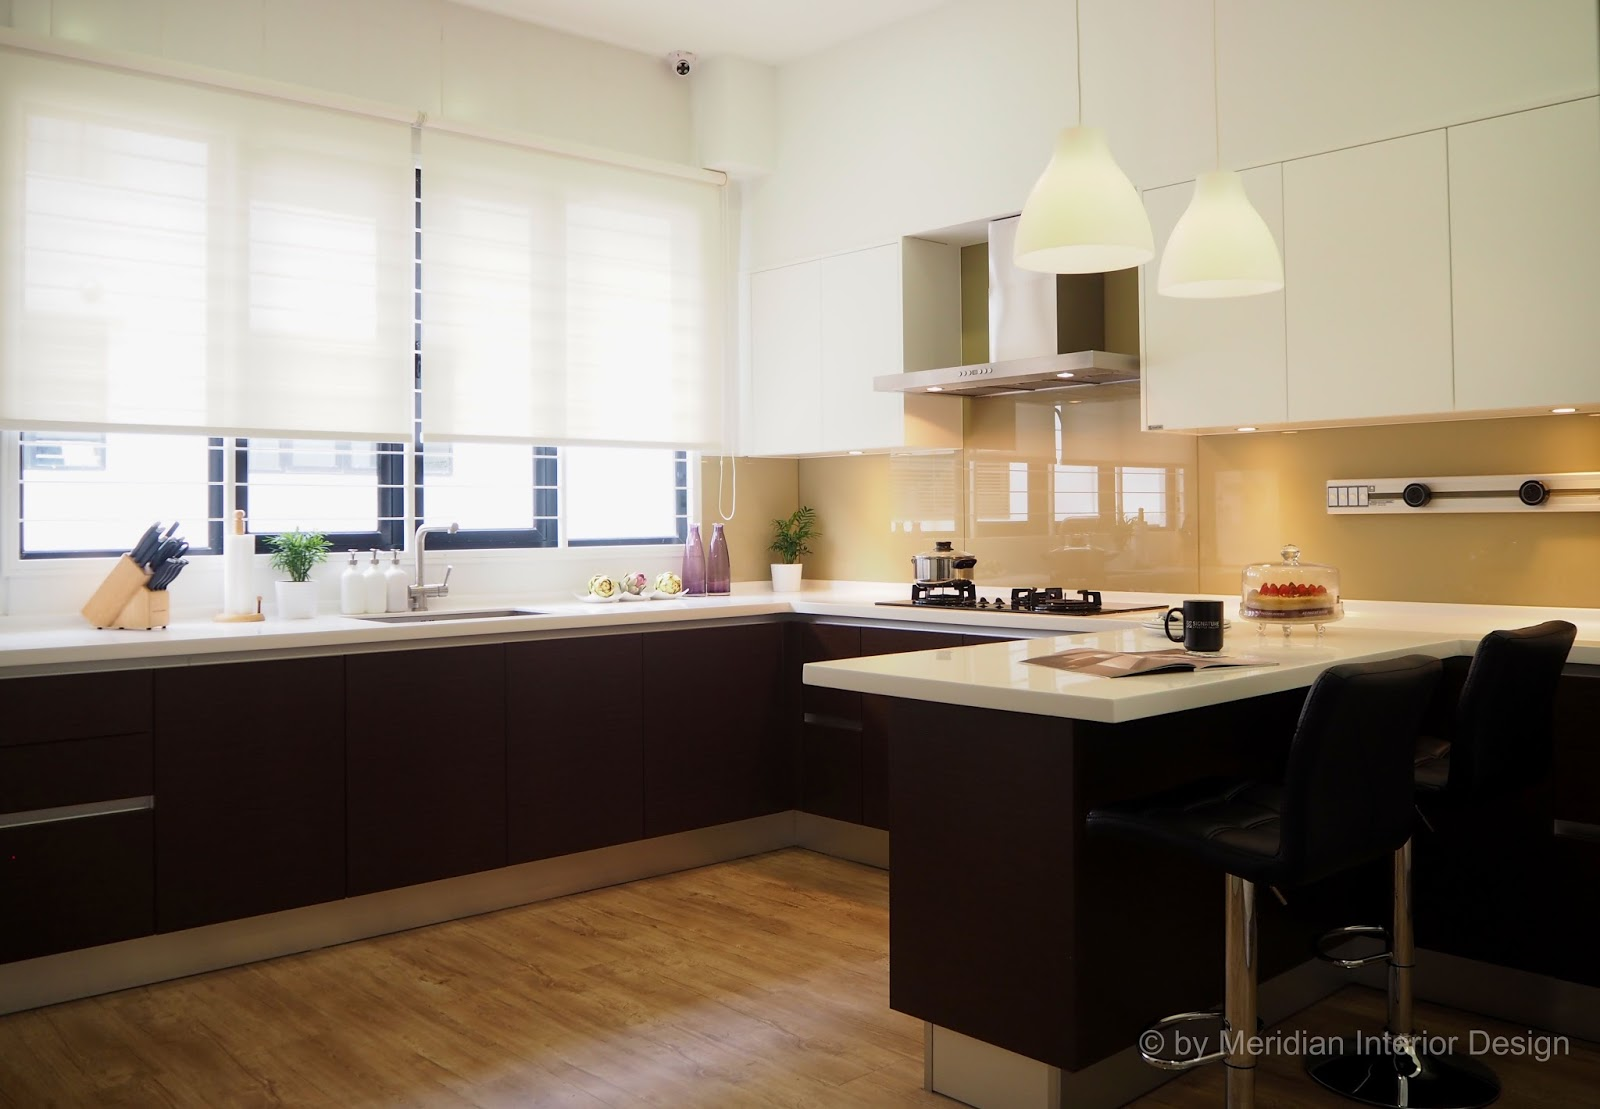 meridian - interior design and kitchen design, in kuala lumpur